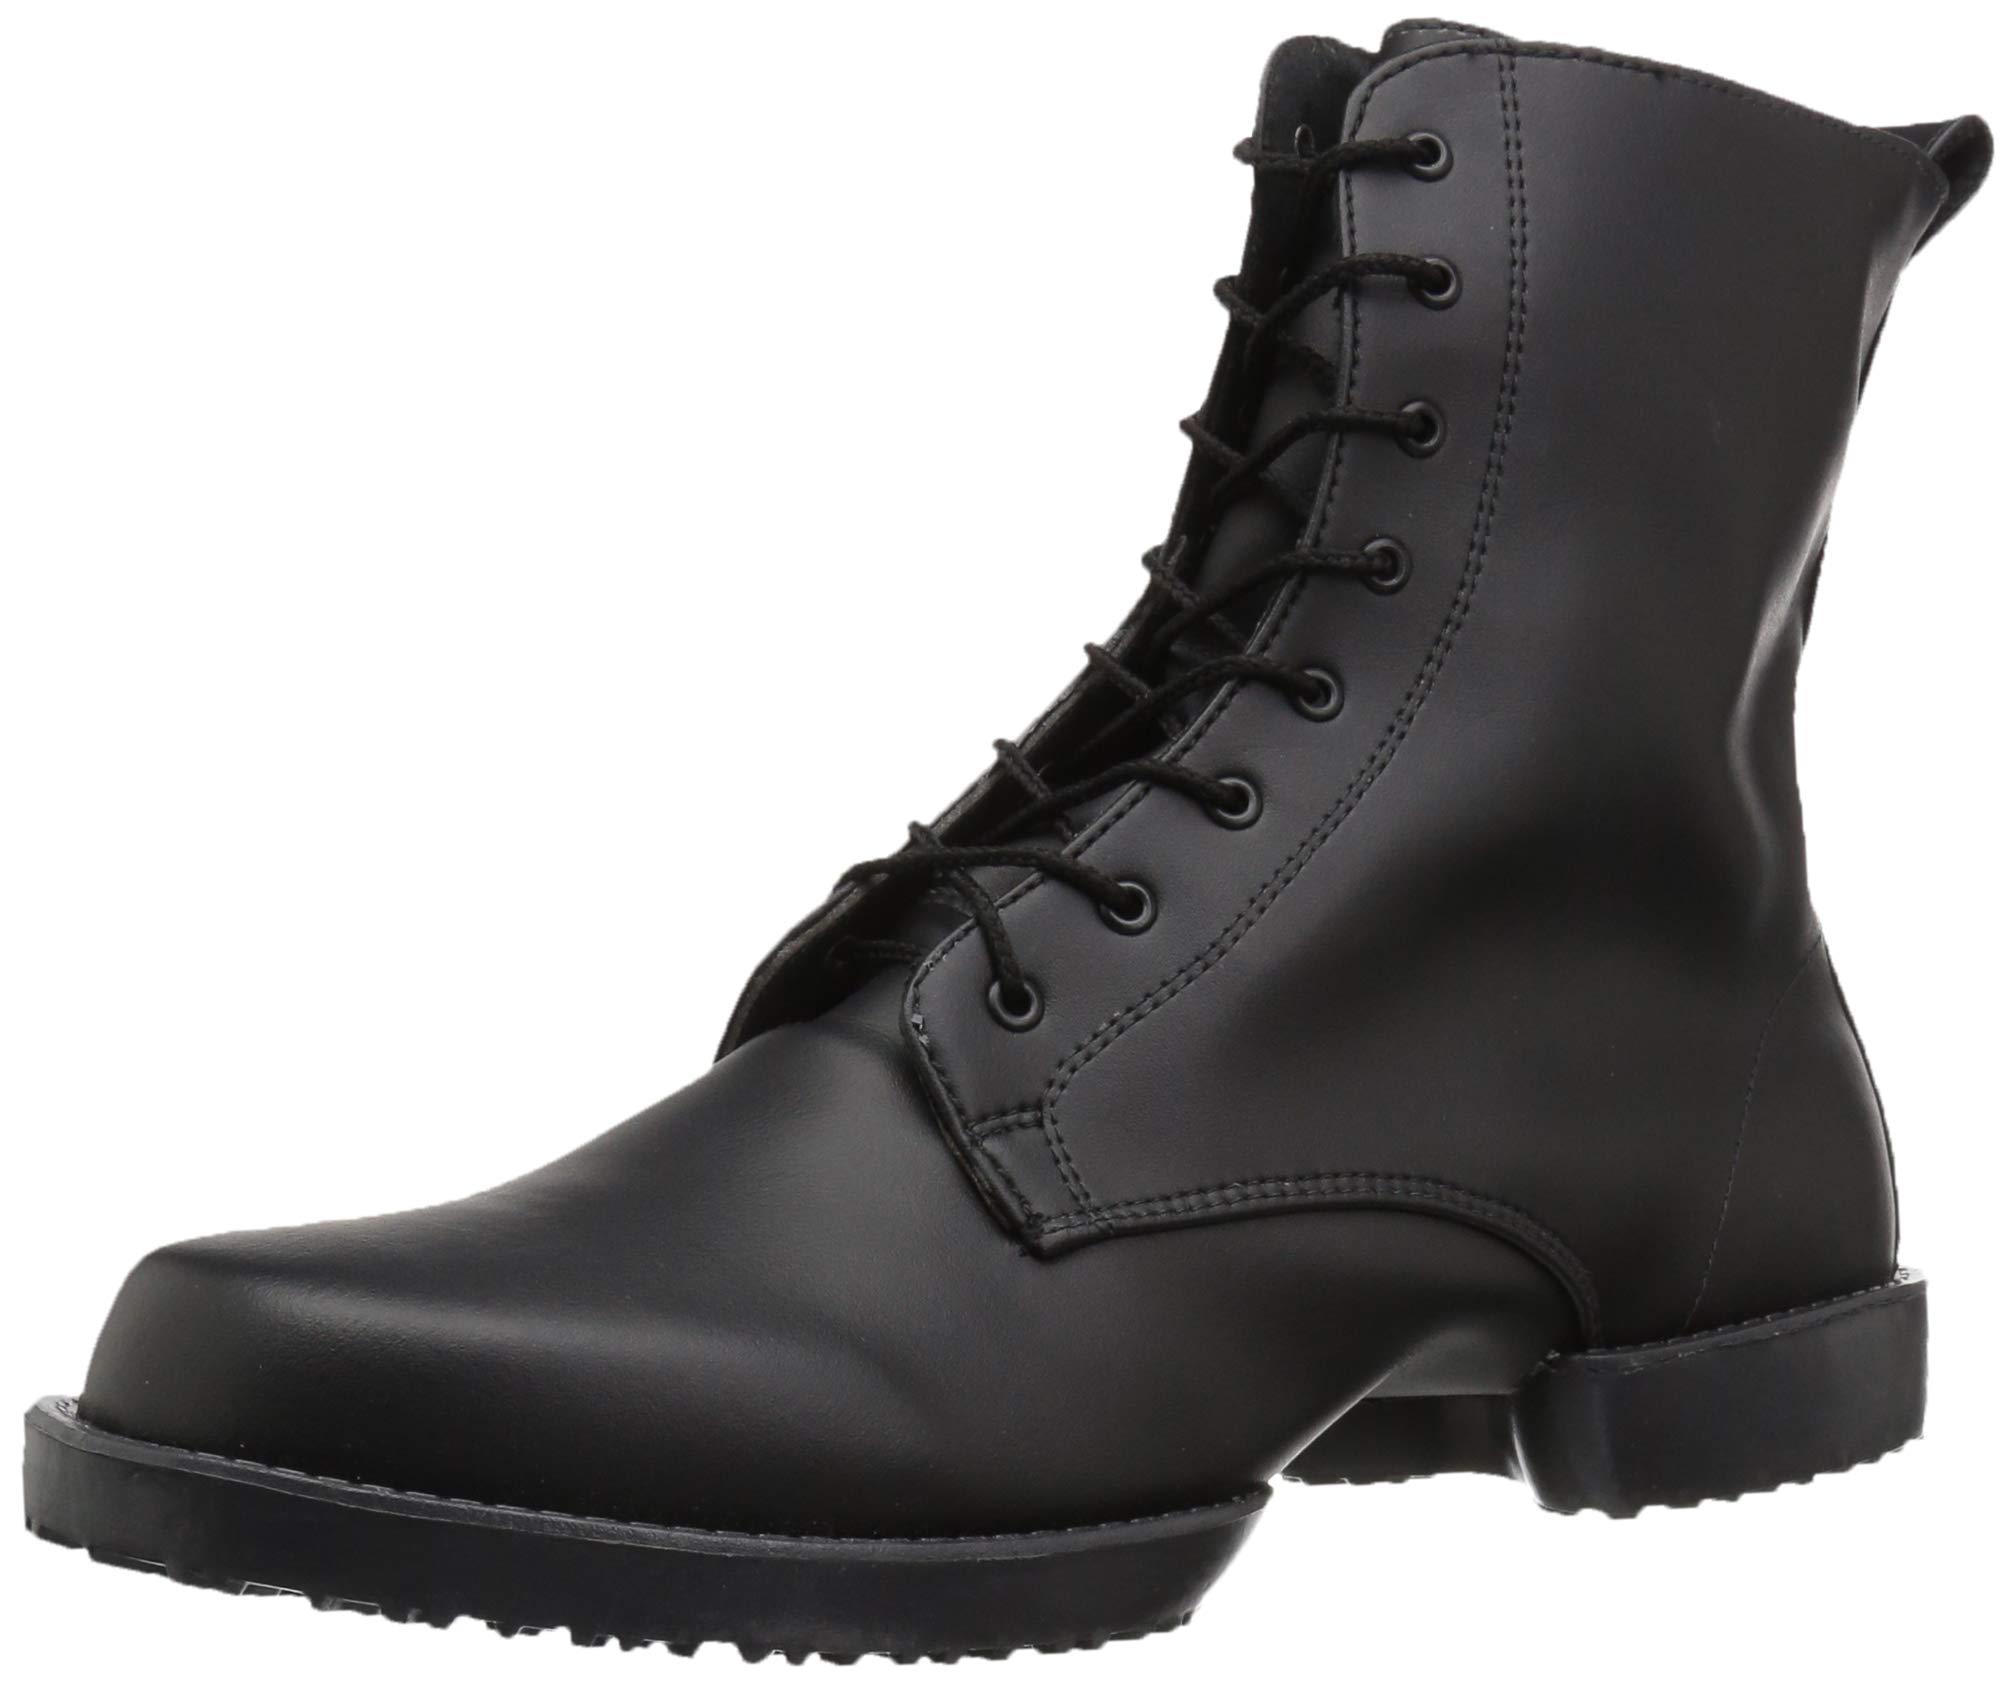 Bloch Women's Militaire Hip Hop Boot Dance Shoe, Black, 7 Medium US by Bloch